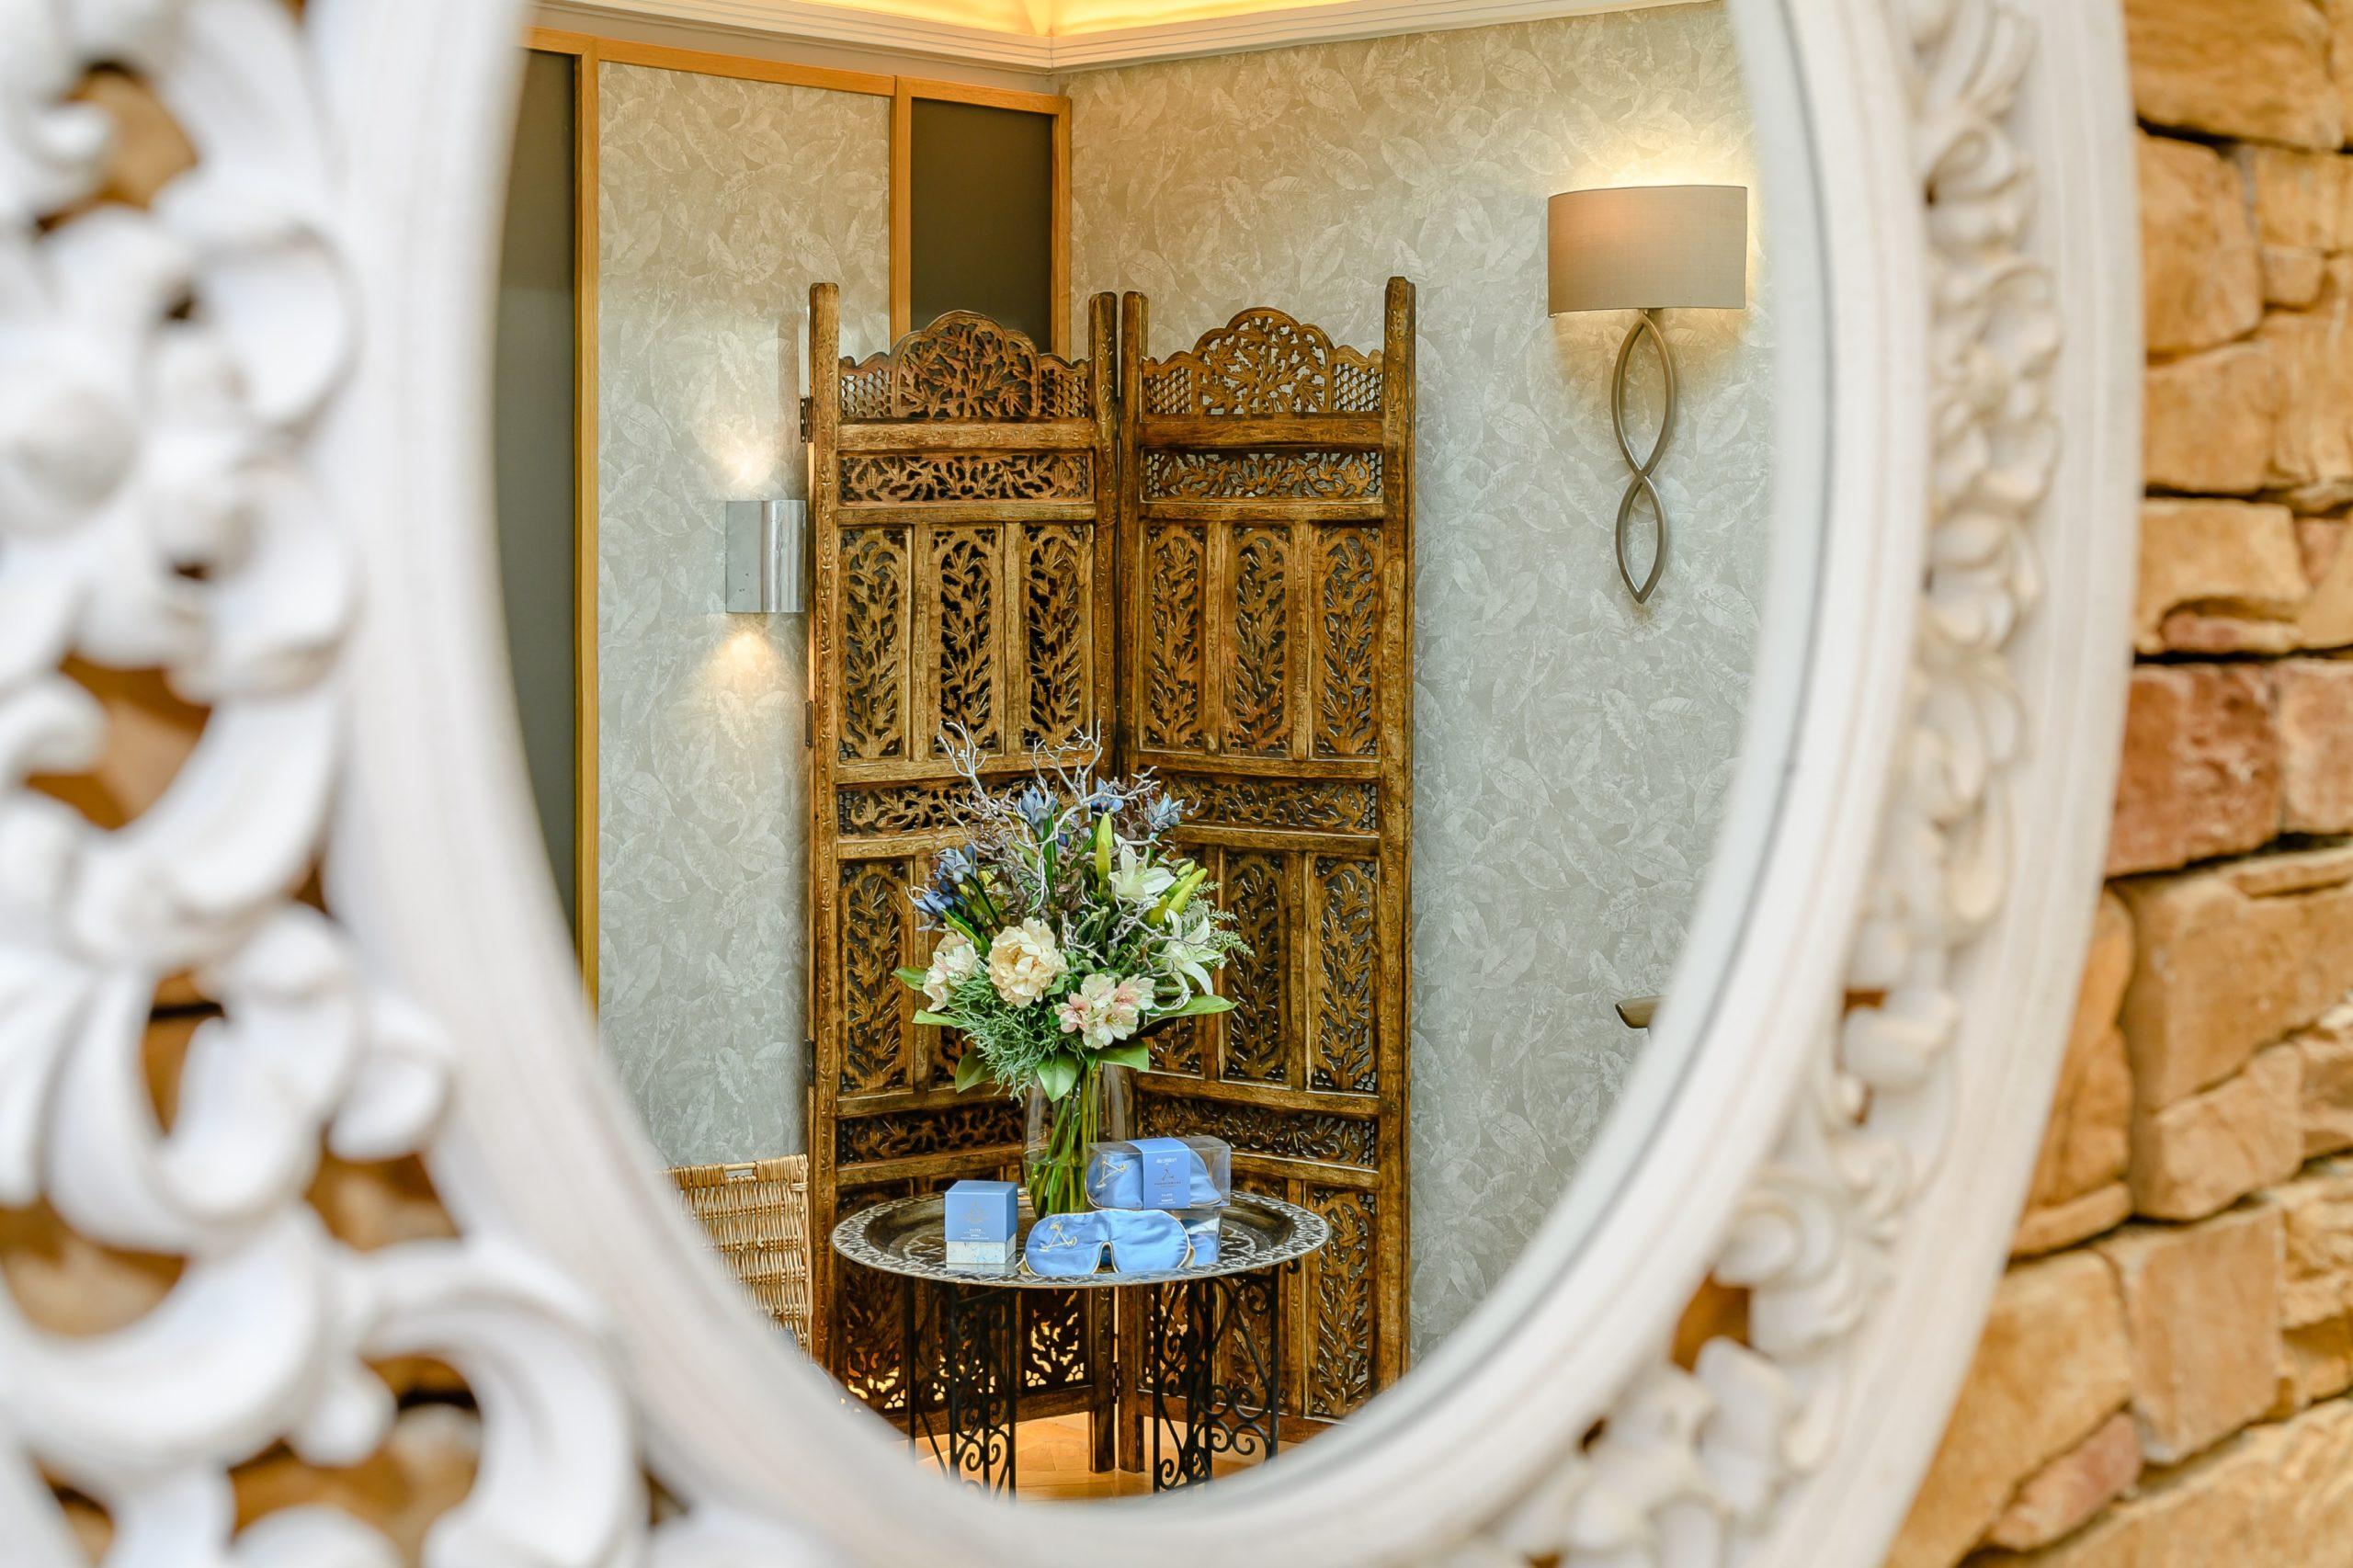 Photo of a mirror in Hawkchurch's spa